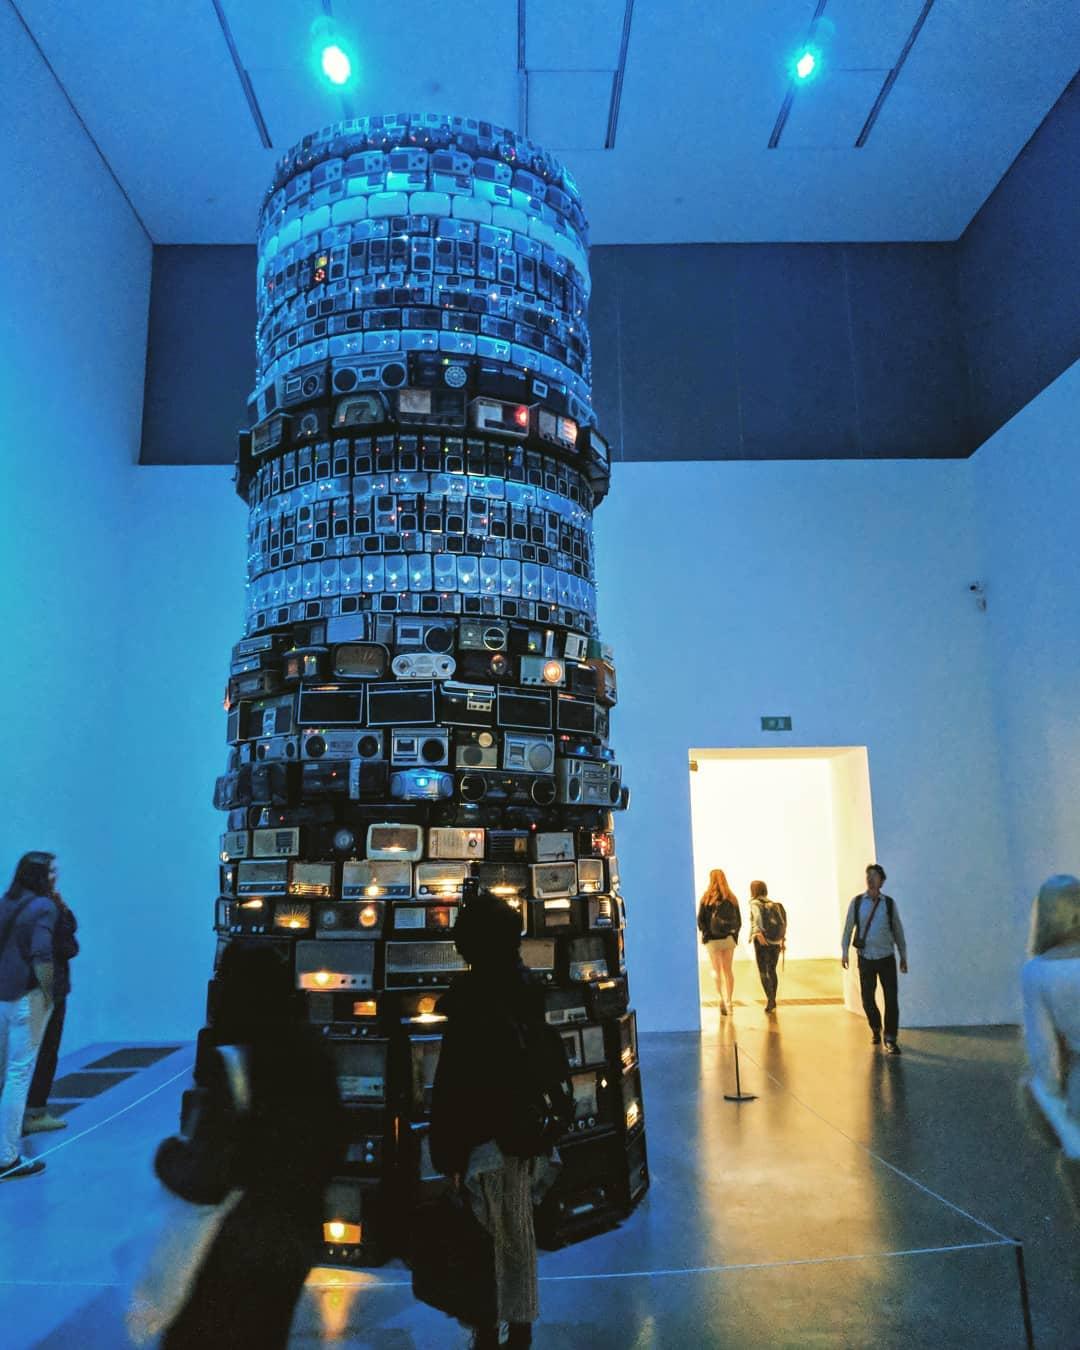 où dormir a londres - Tate gallery